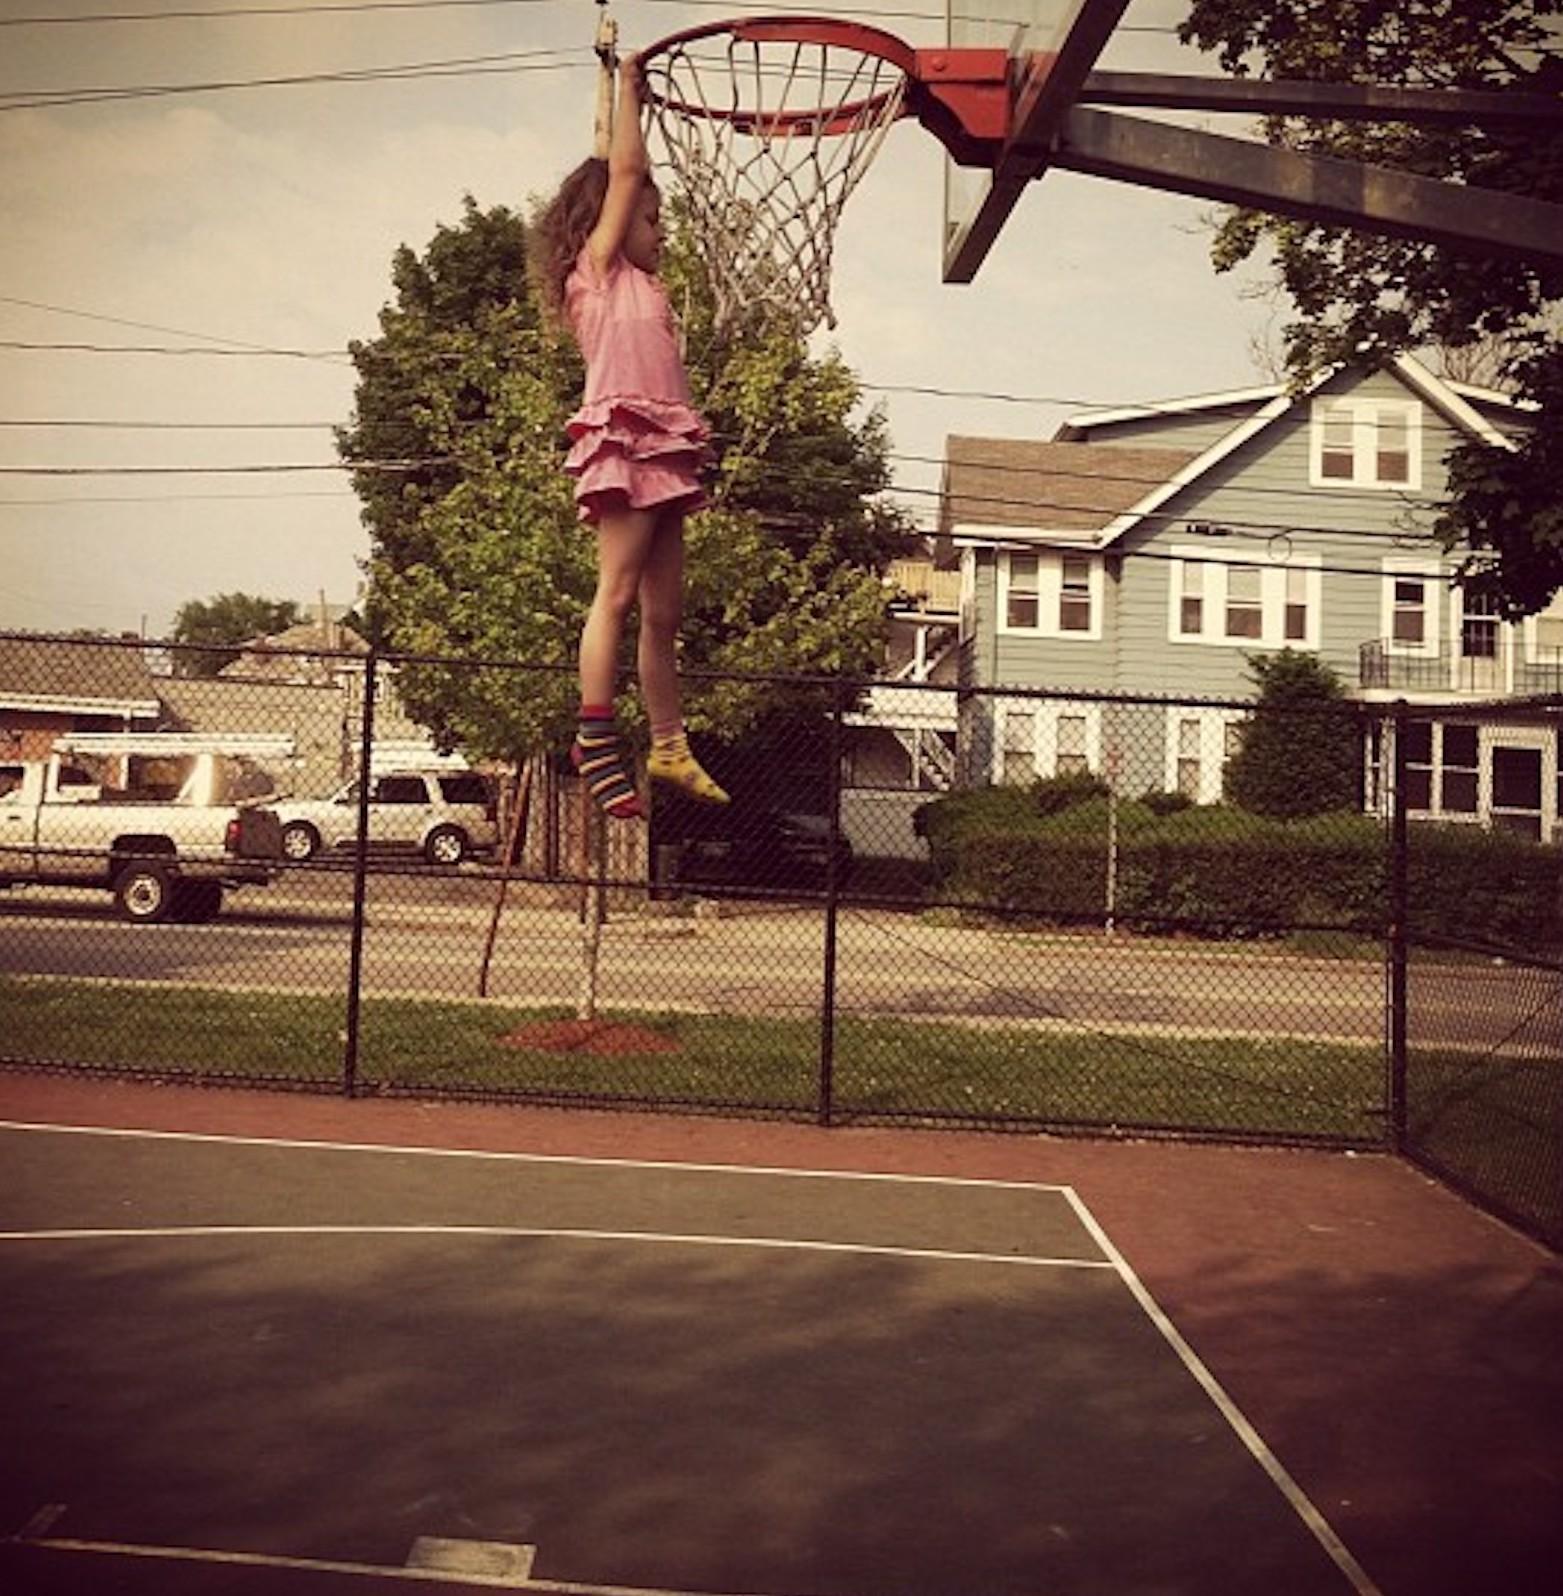 Hanging on a basketball hoop